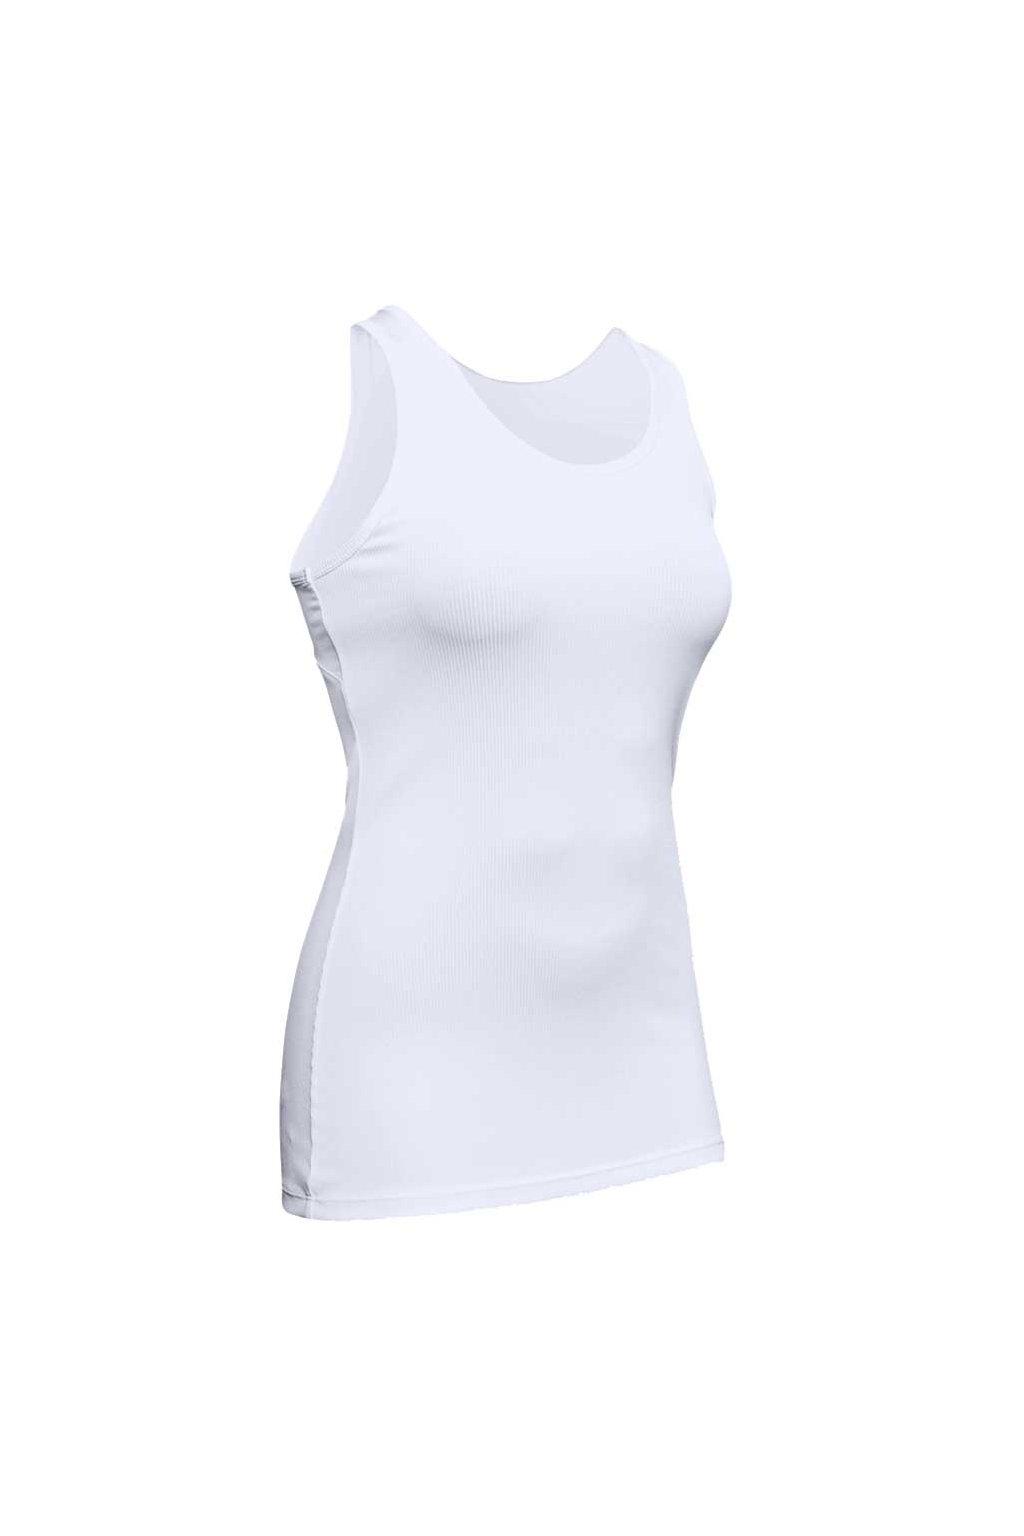 Dámske tričko Under Armour Victory Tank biele 1349123 100